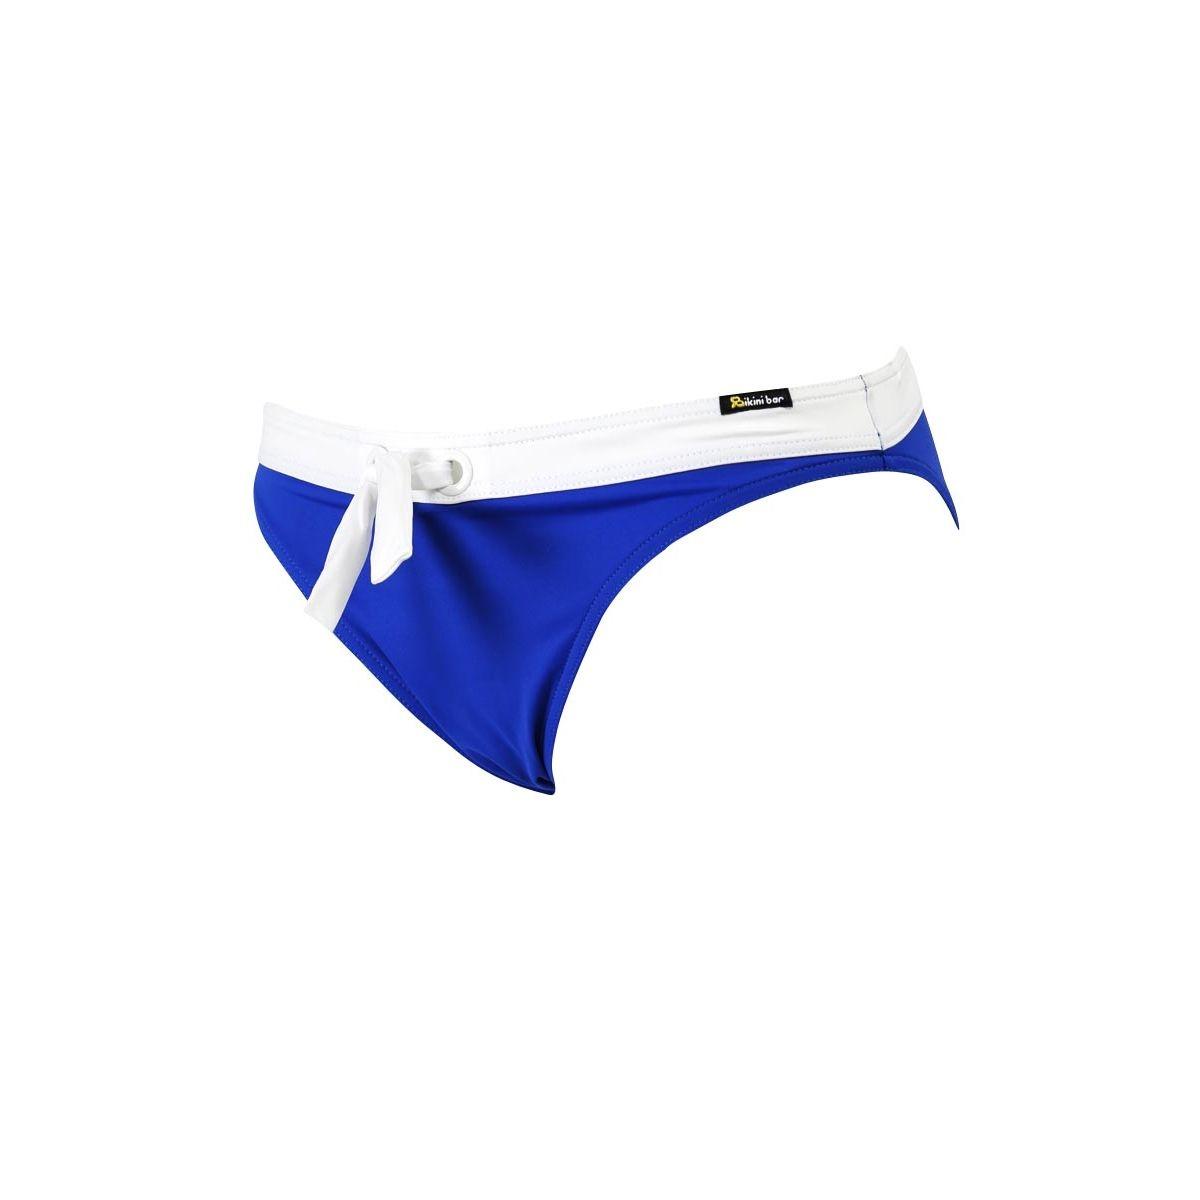 Bas de maillot de bain Culotte Santander